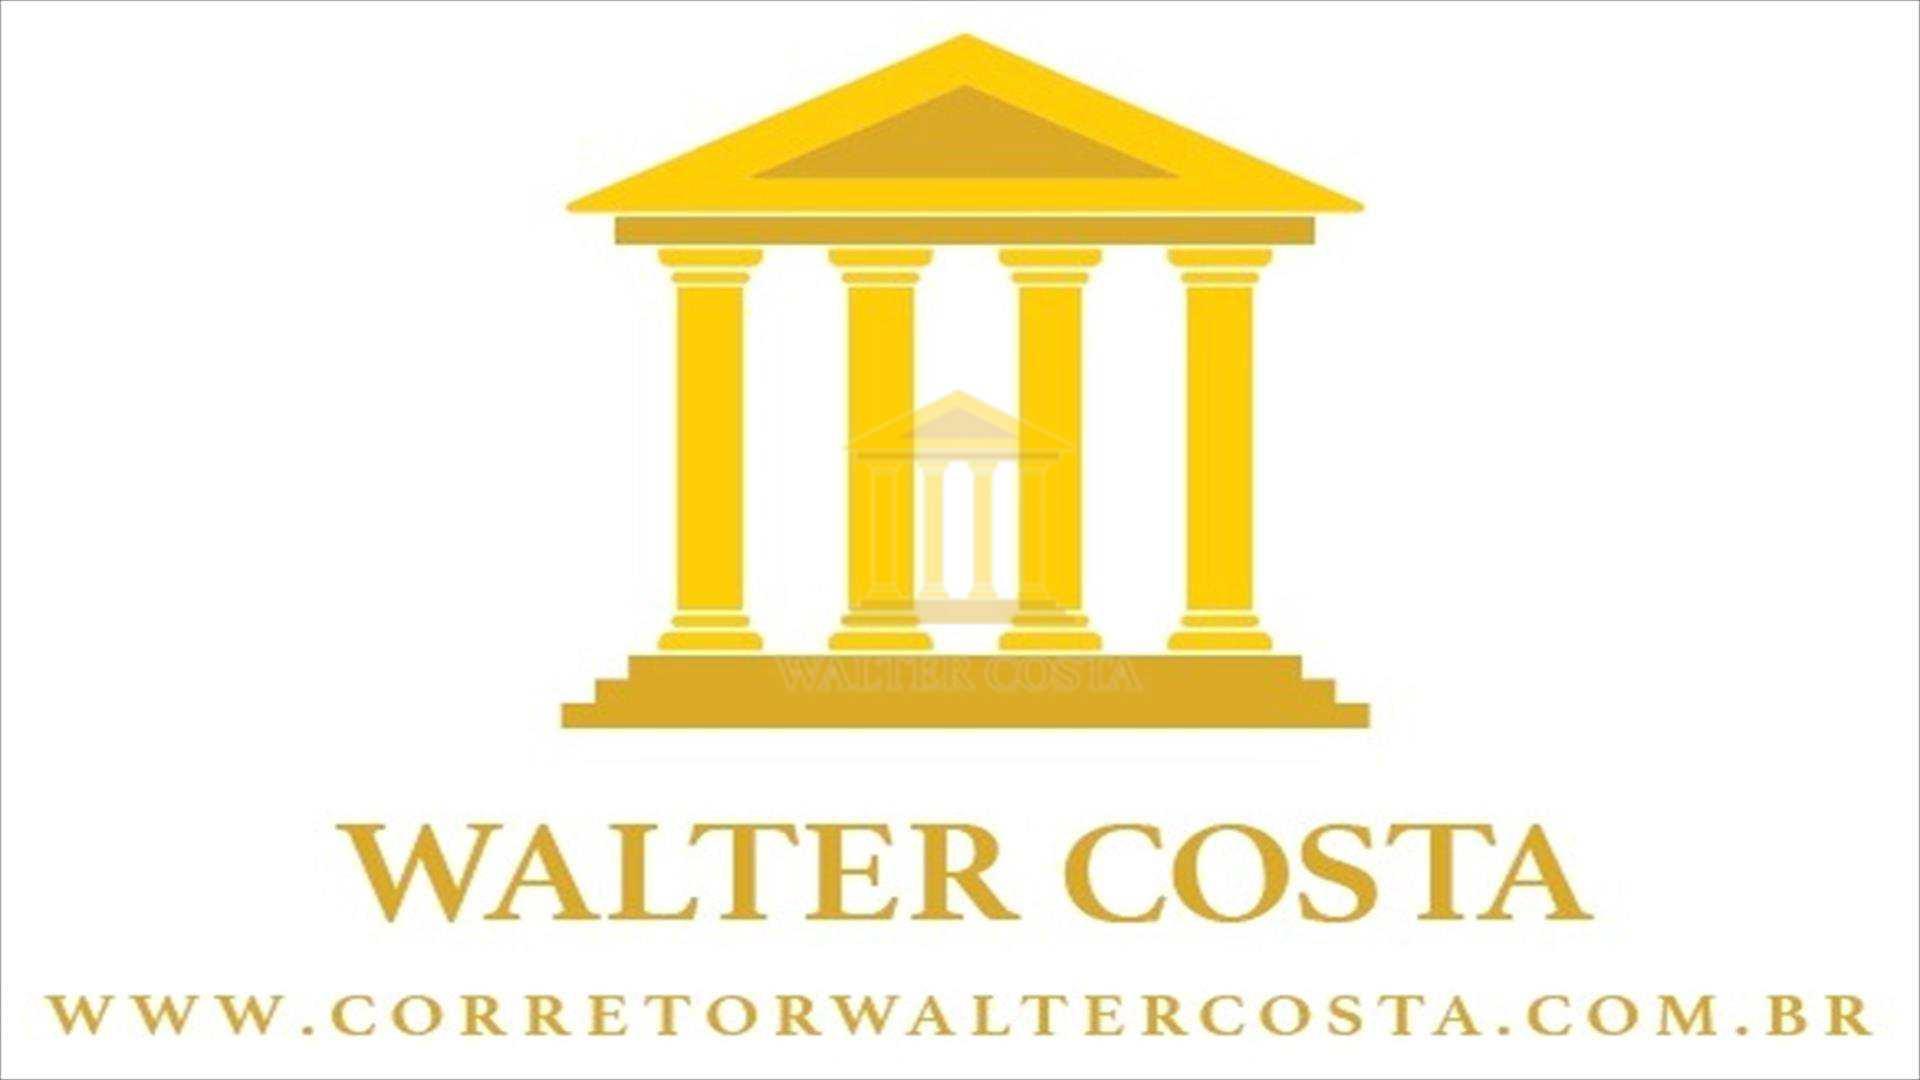 6800-LOGO_CORRETOR_WALTER_COSTA_NOVO.jpg